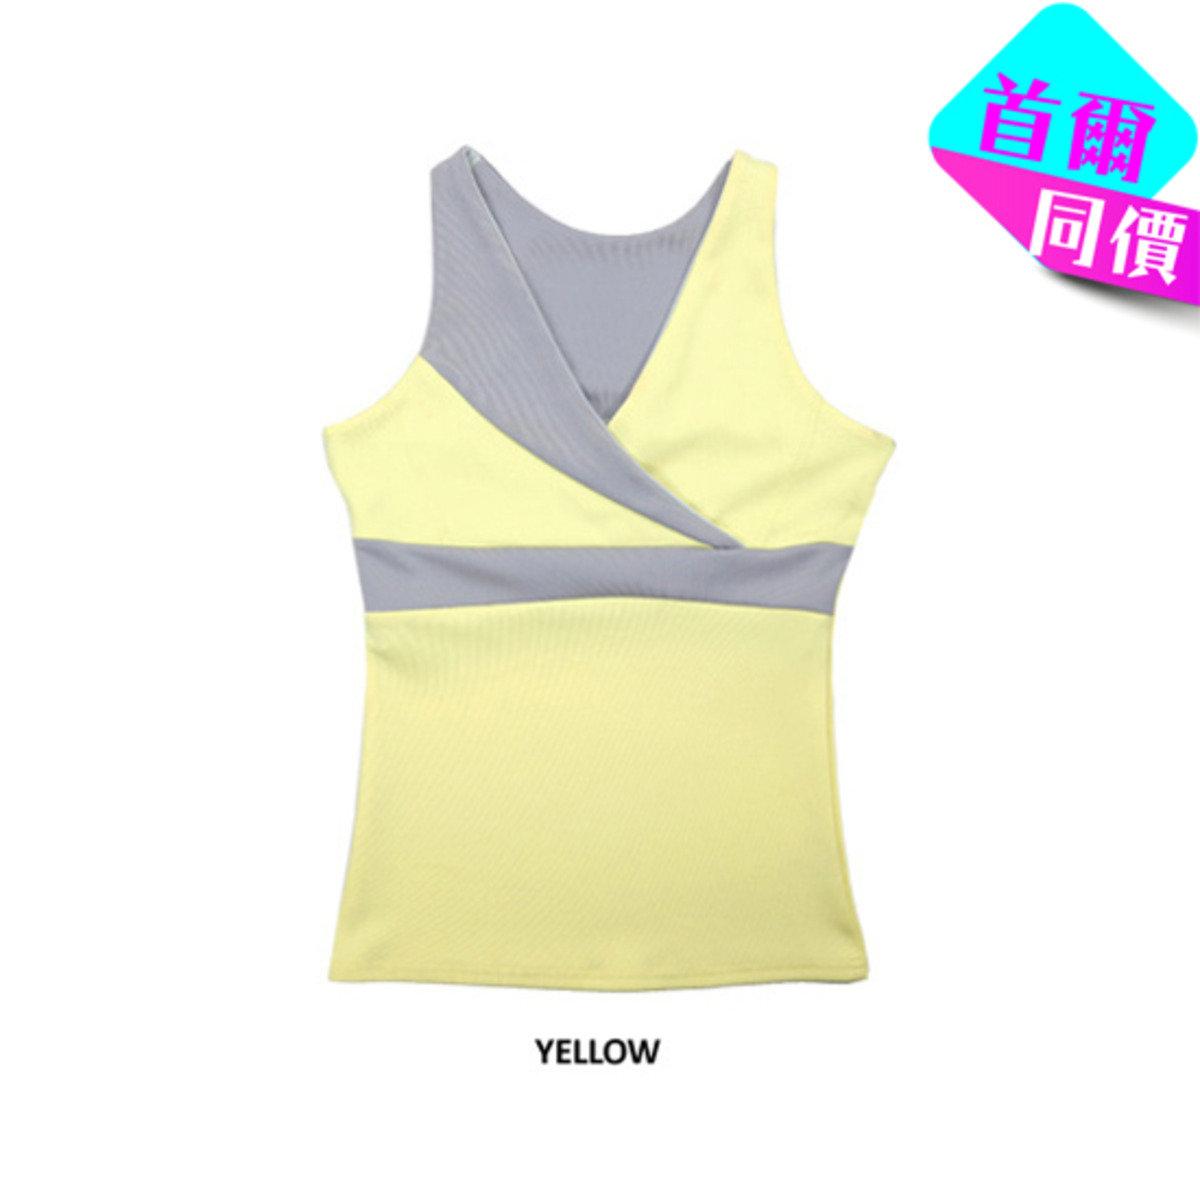 Sculling 拼色工字背心_RA20150909-420